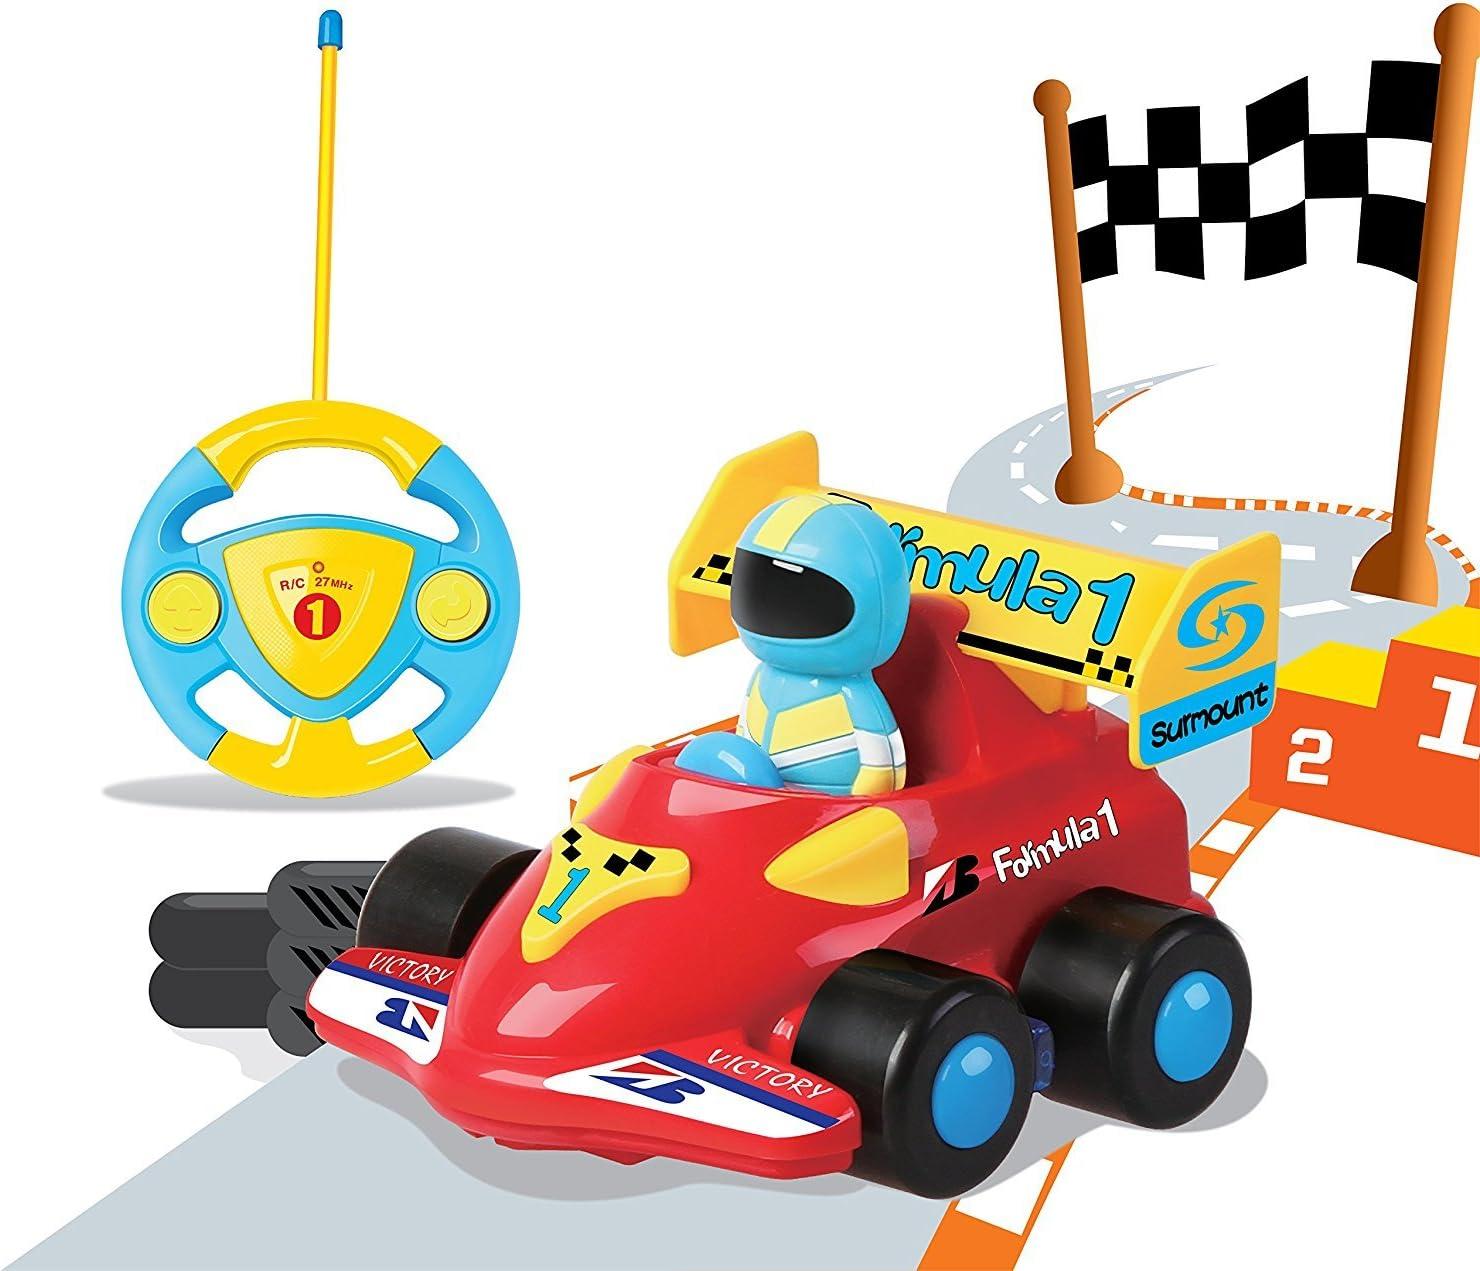 Cartoon R C Formula Race Car Baltimore Mall Import Control Toy by Liberty Radio Denver Mall